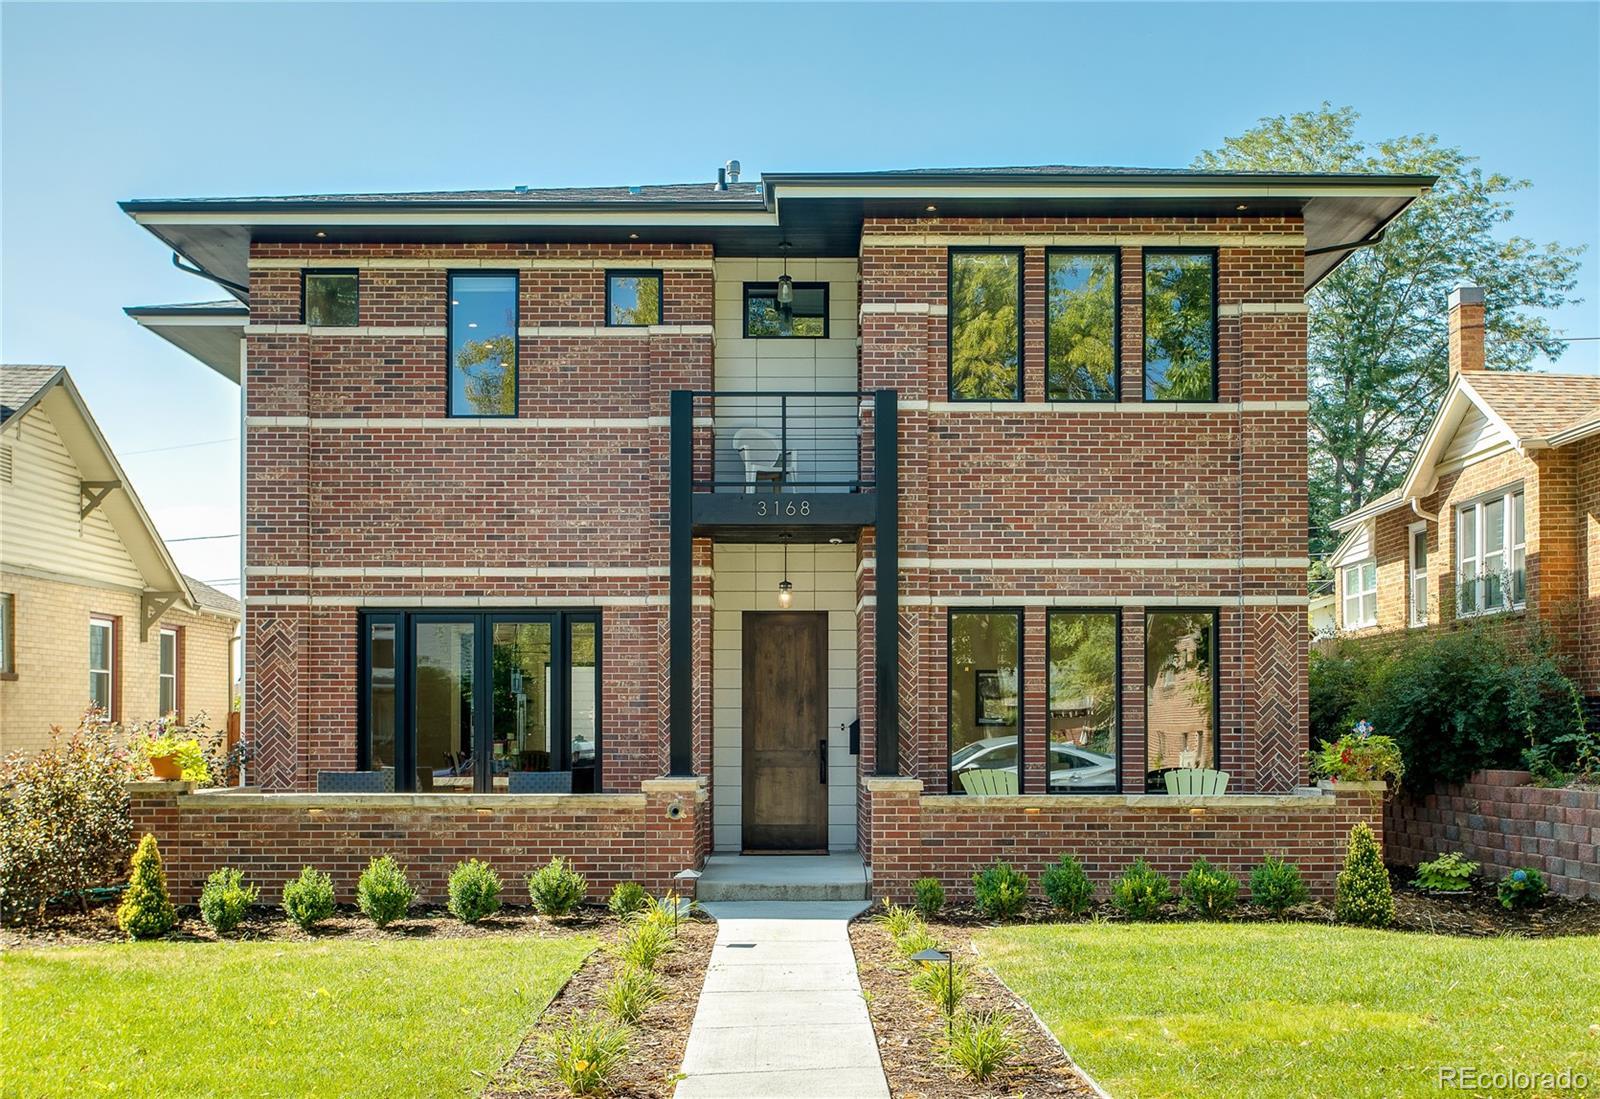 3168 W 40th Avenue, Denver, CO 80211 - Denver, CO real estate listing